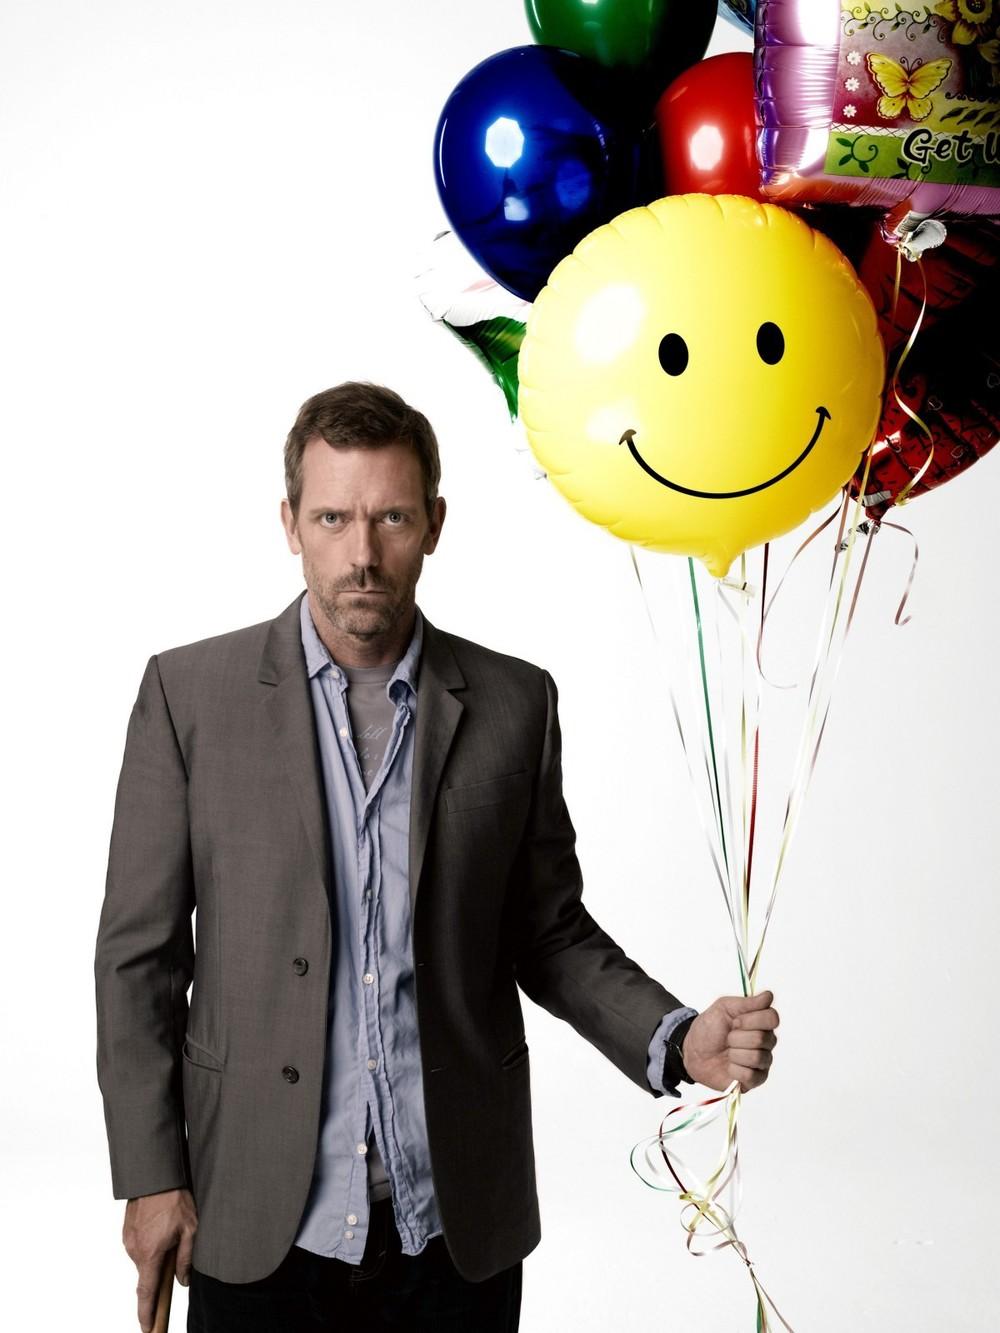 26756_house_balloons_122_451lo.jpg